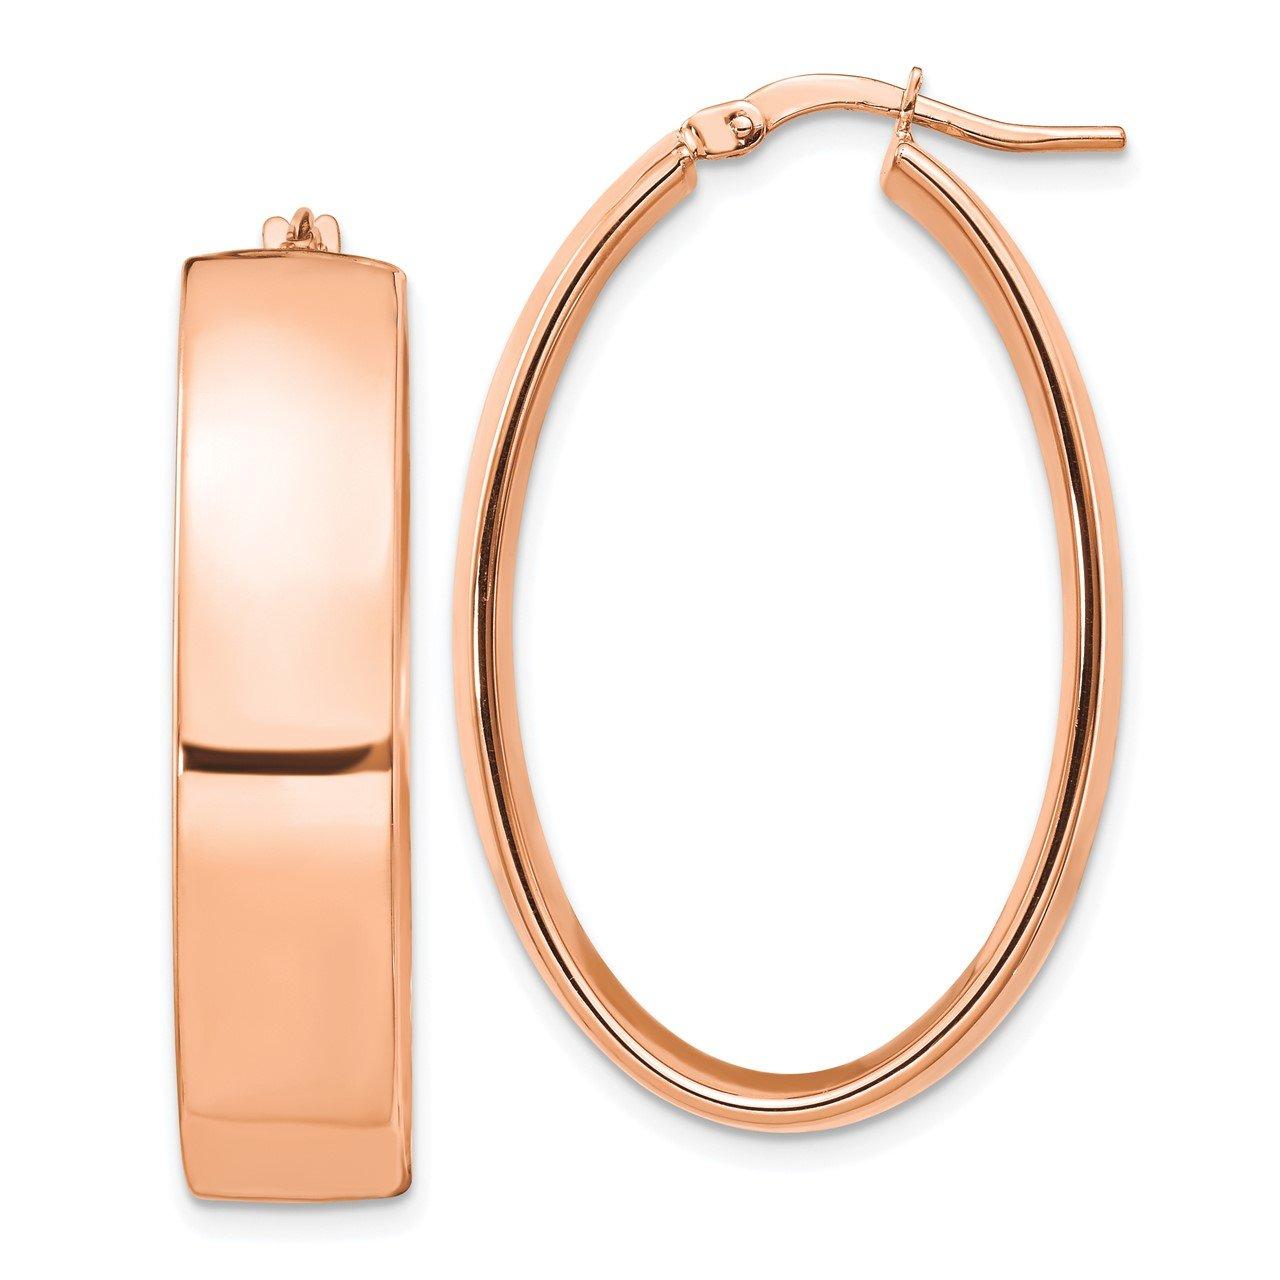 Leslie's 14K Rose Gold 7.75mm High Polished Oval Hoop Earrings